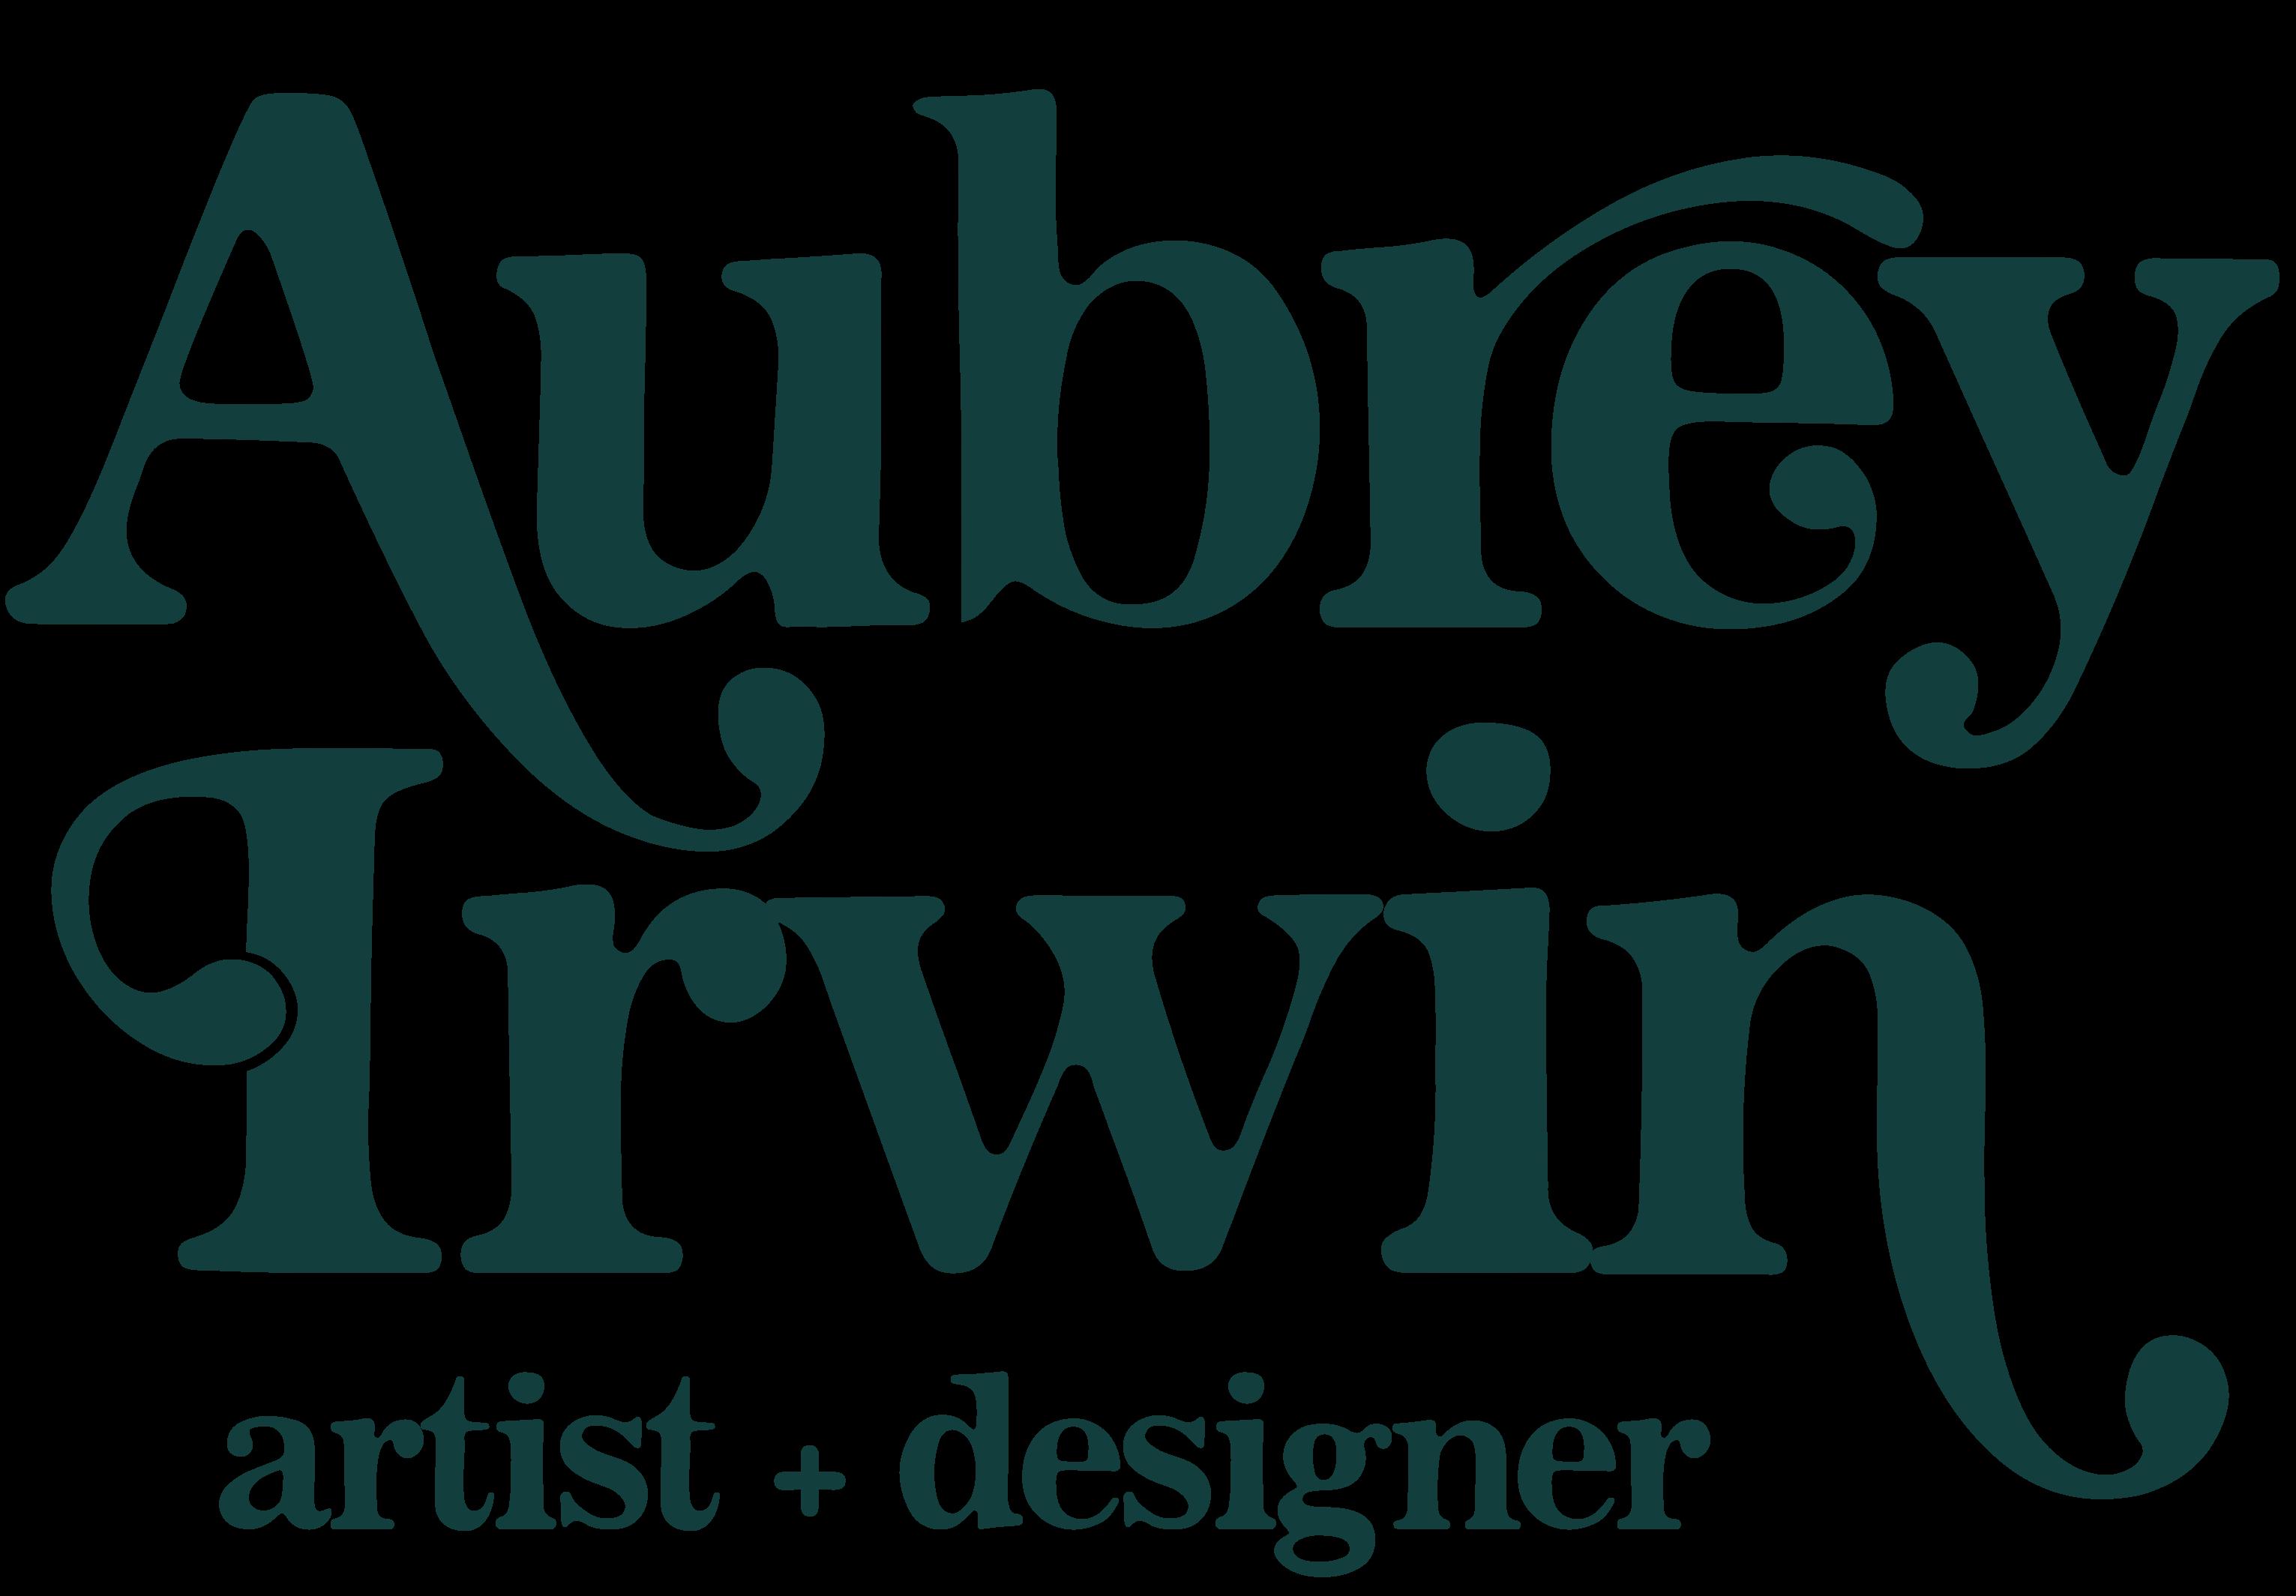 Aubrey Irwin